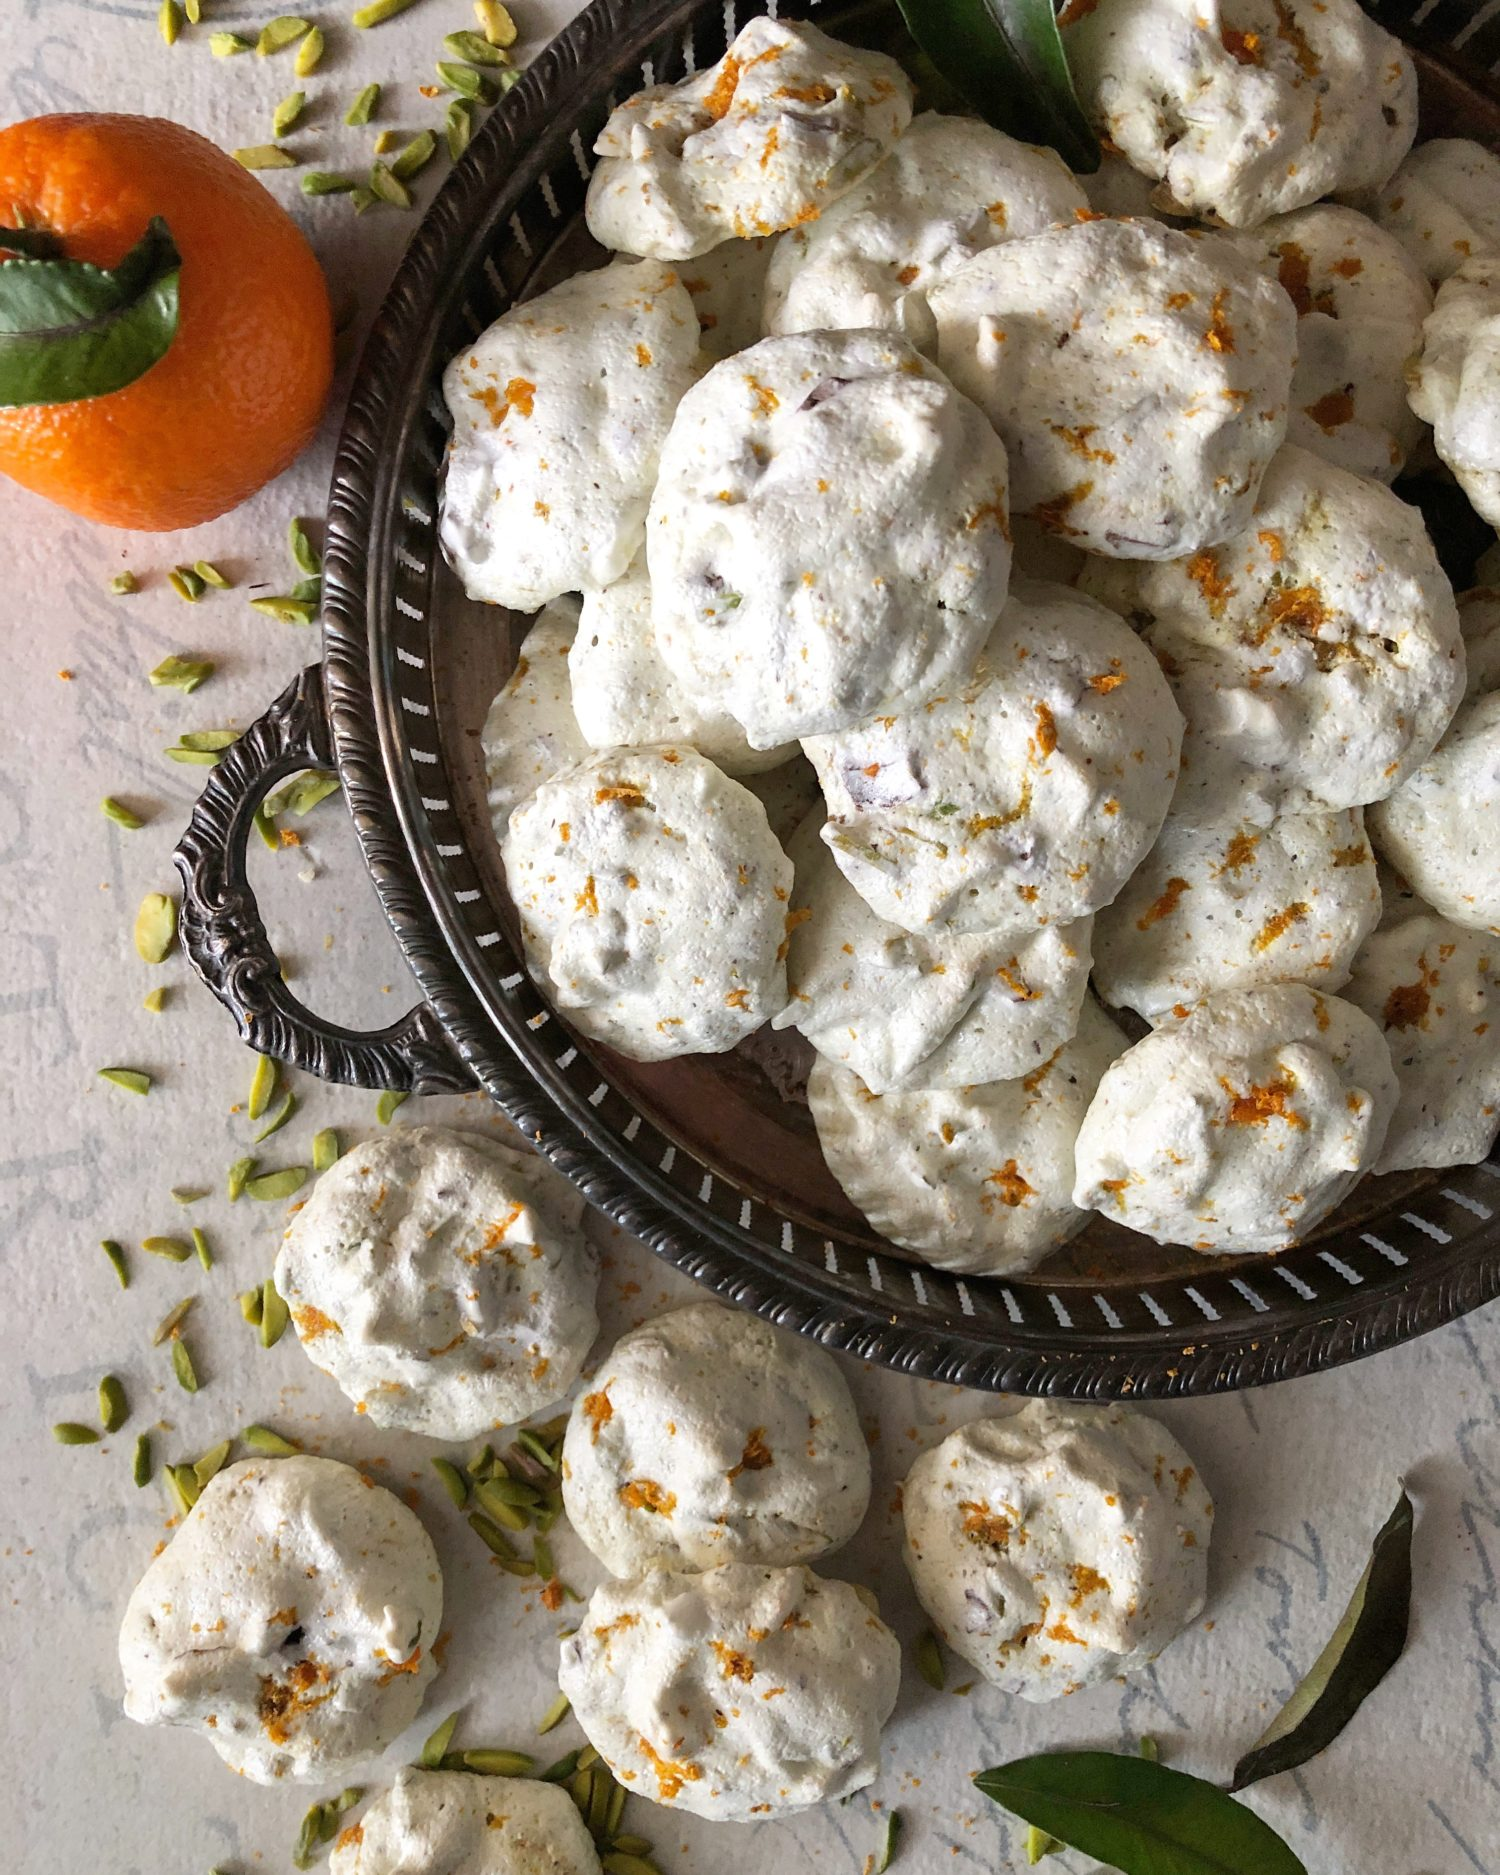 tender orange, pistachio and chocolate meringue cookies, forget-me-nots